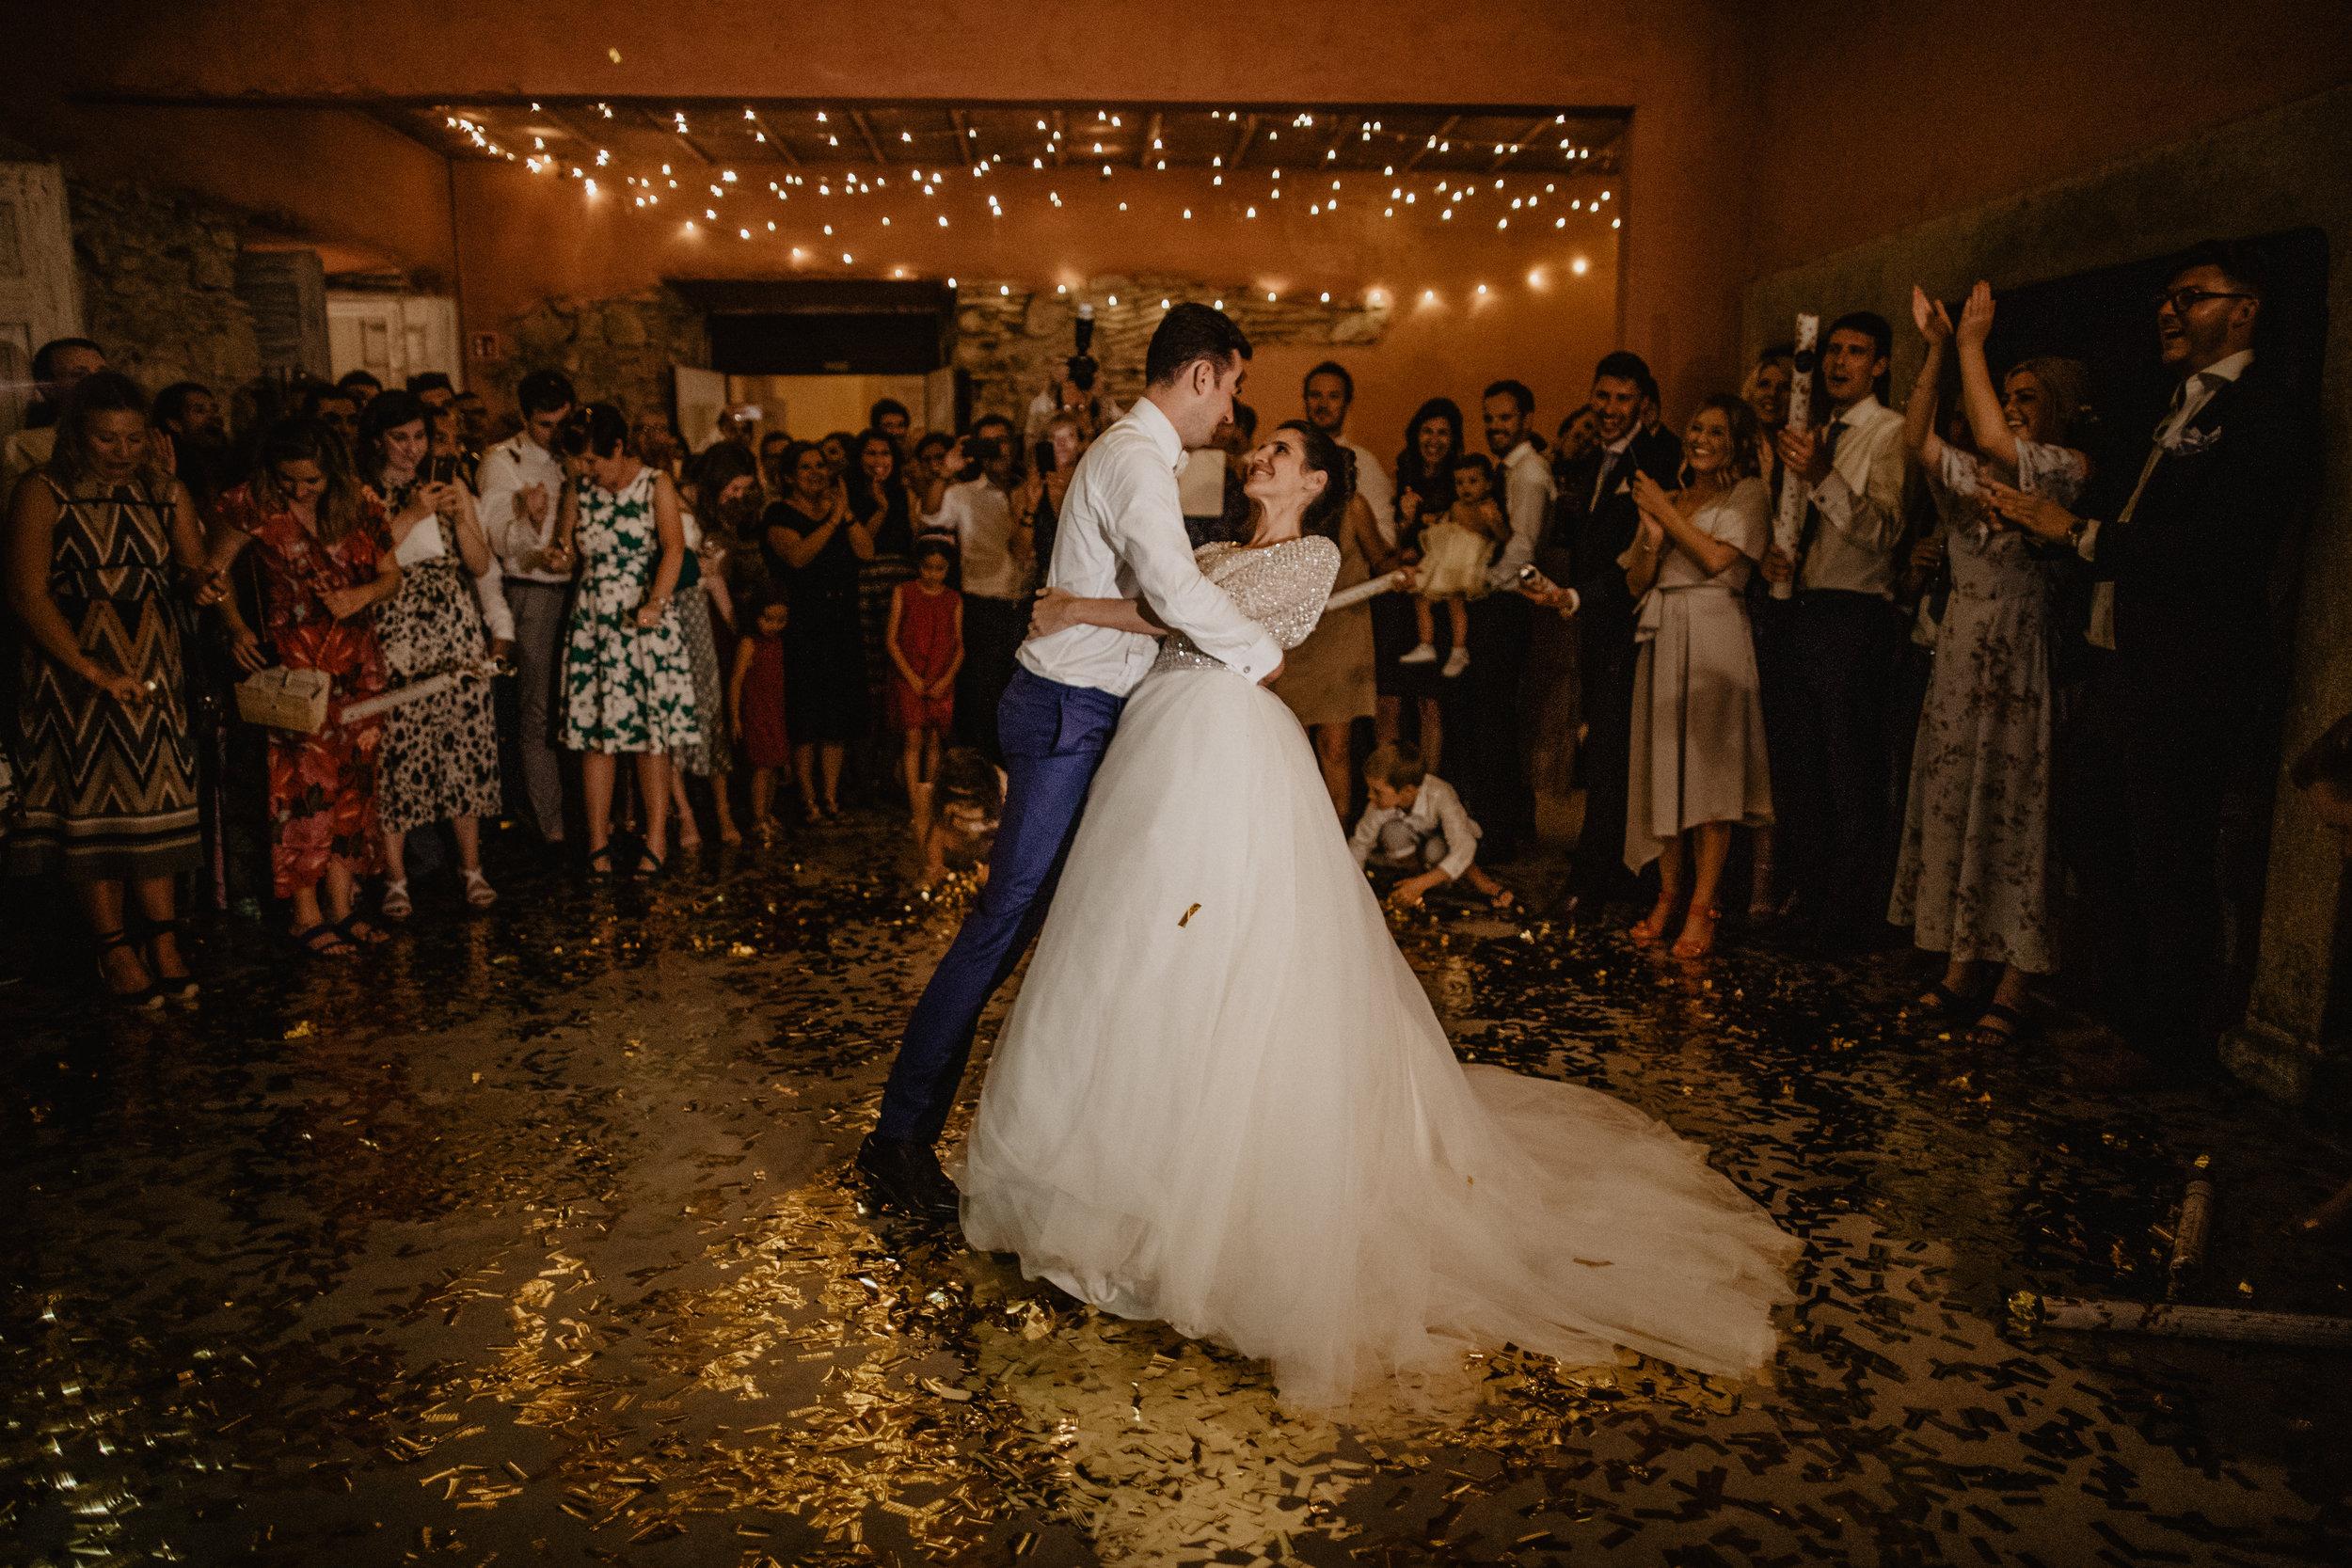 Lapela-photography-wedding-sintra-portugal-129.jpg